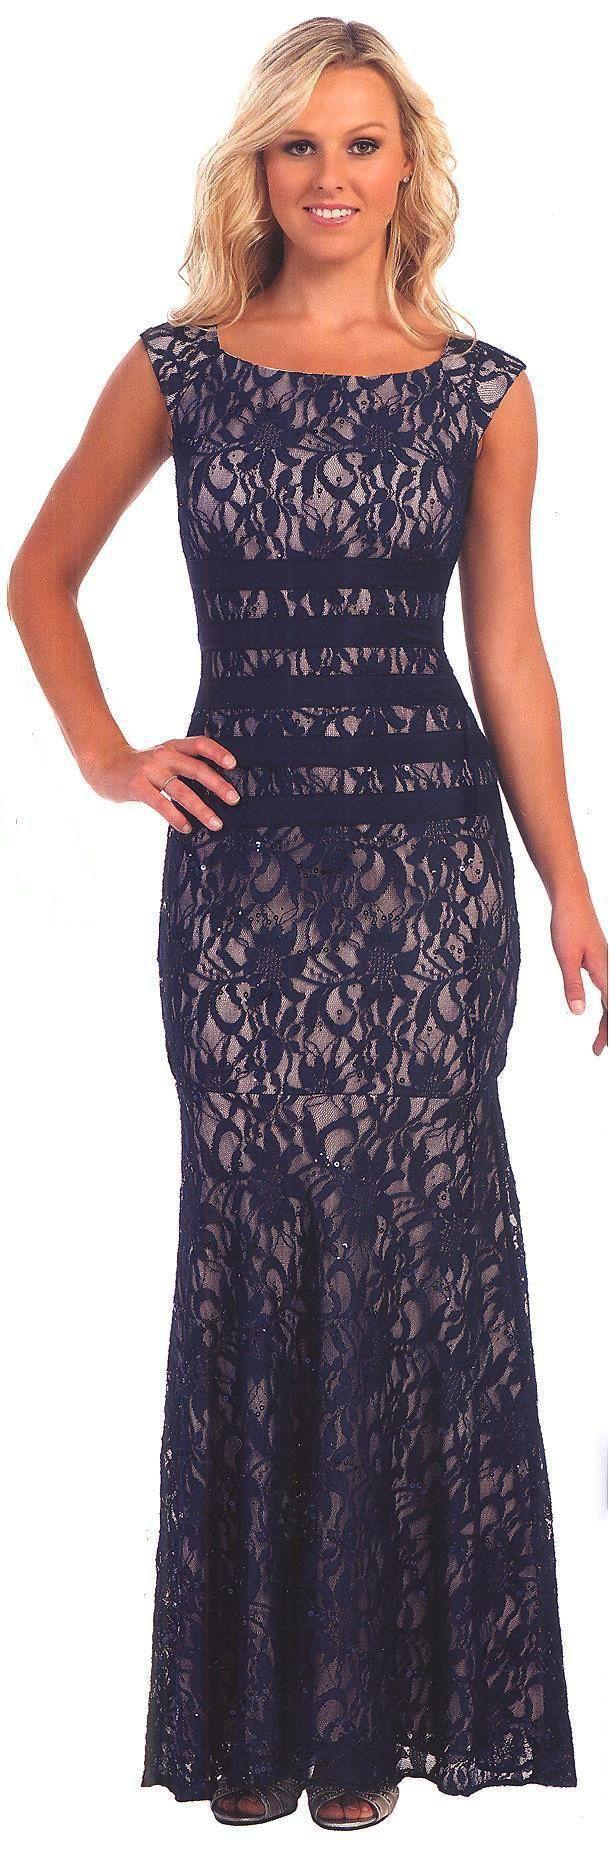 Awesome Mermaid Dresses Evening Dresses Bridesmaid Dresses UNDER $100<BR>4950<BR>Full length...